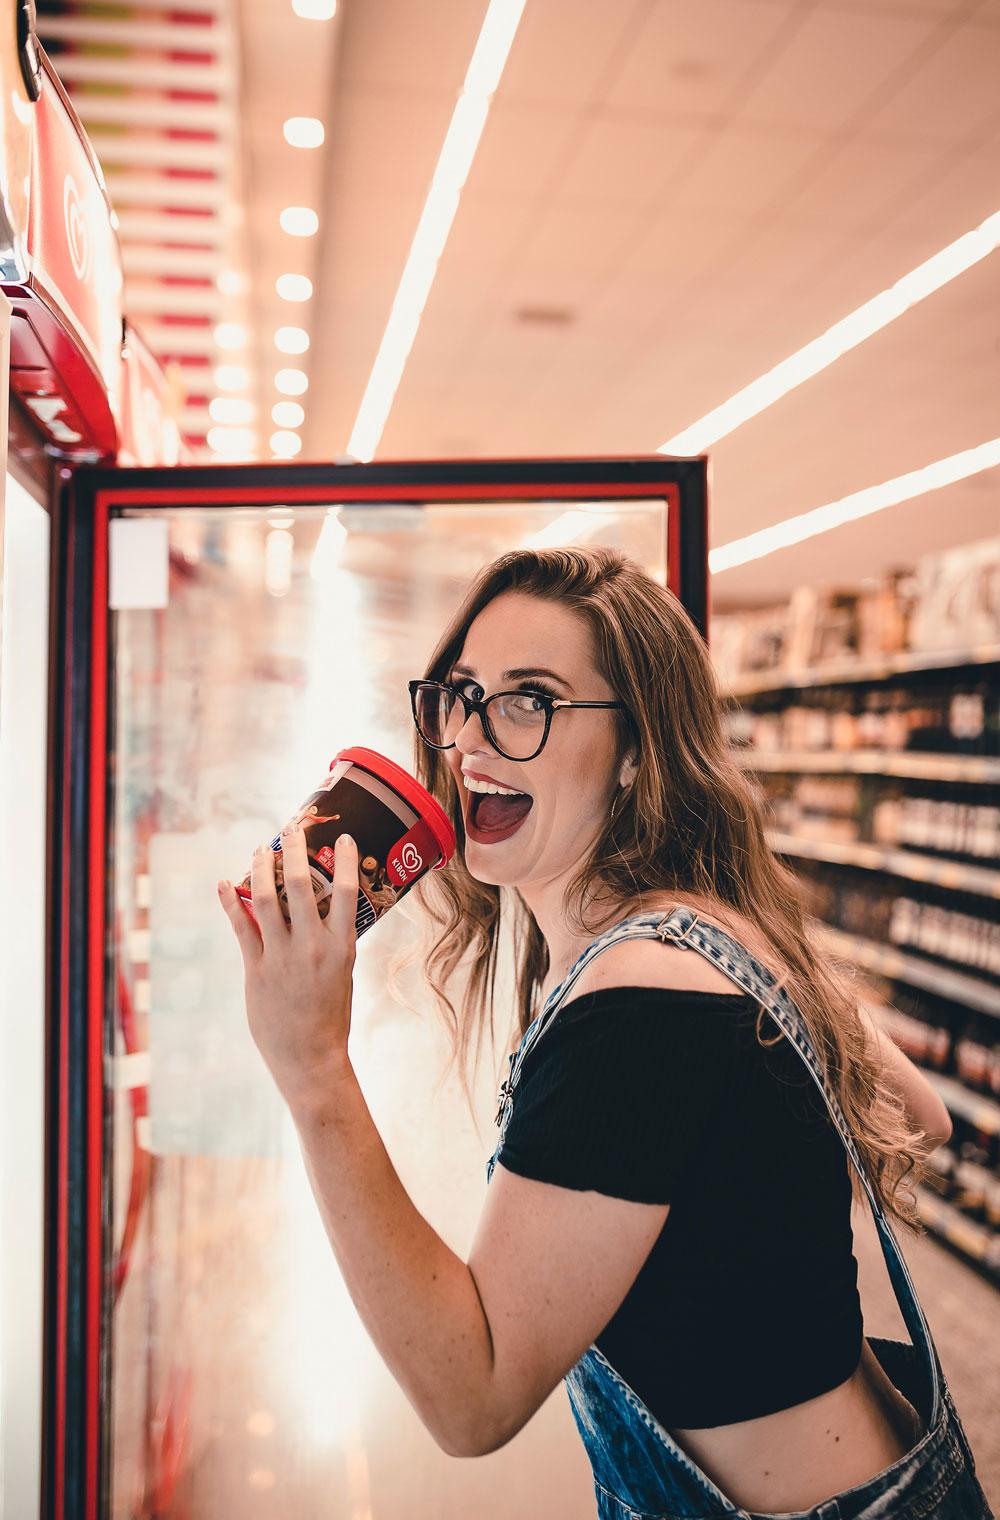 woman-holding-ice-cream-tub-2295192